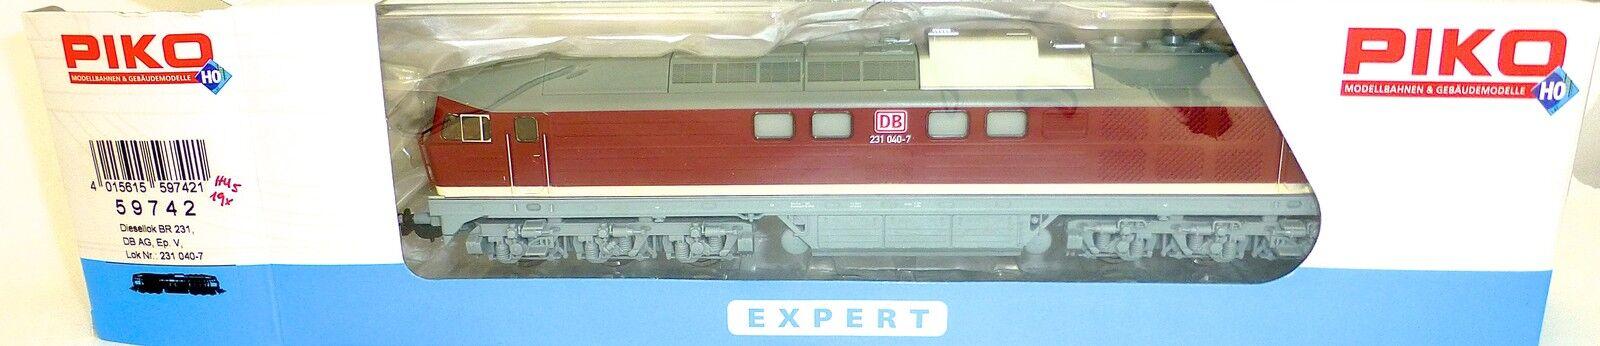 Br 231 Locomotora Diésel Db Ag Epv Dss Piko 59742 H0 1 87 Emb. Orig. Nuevo HU5 Μ